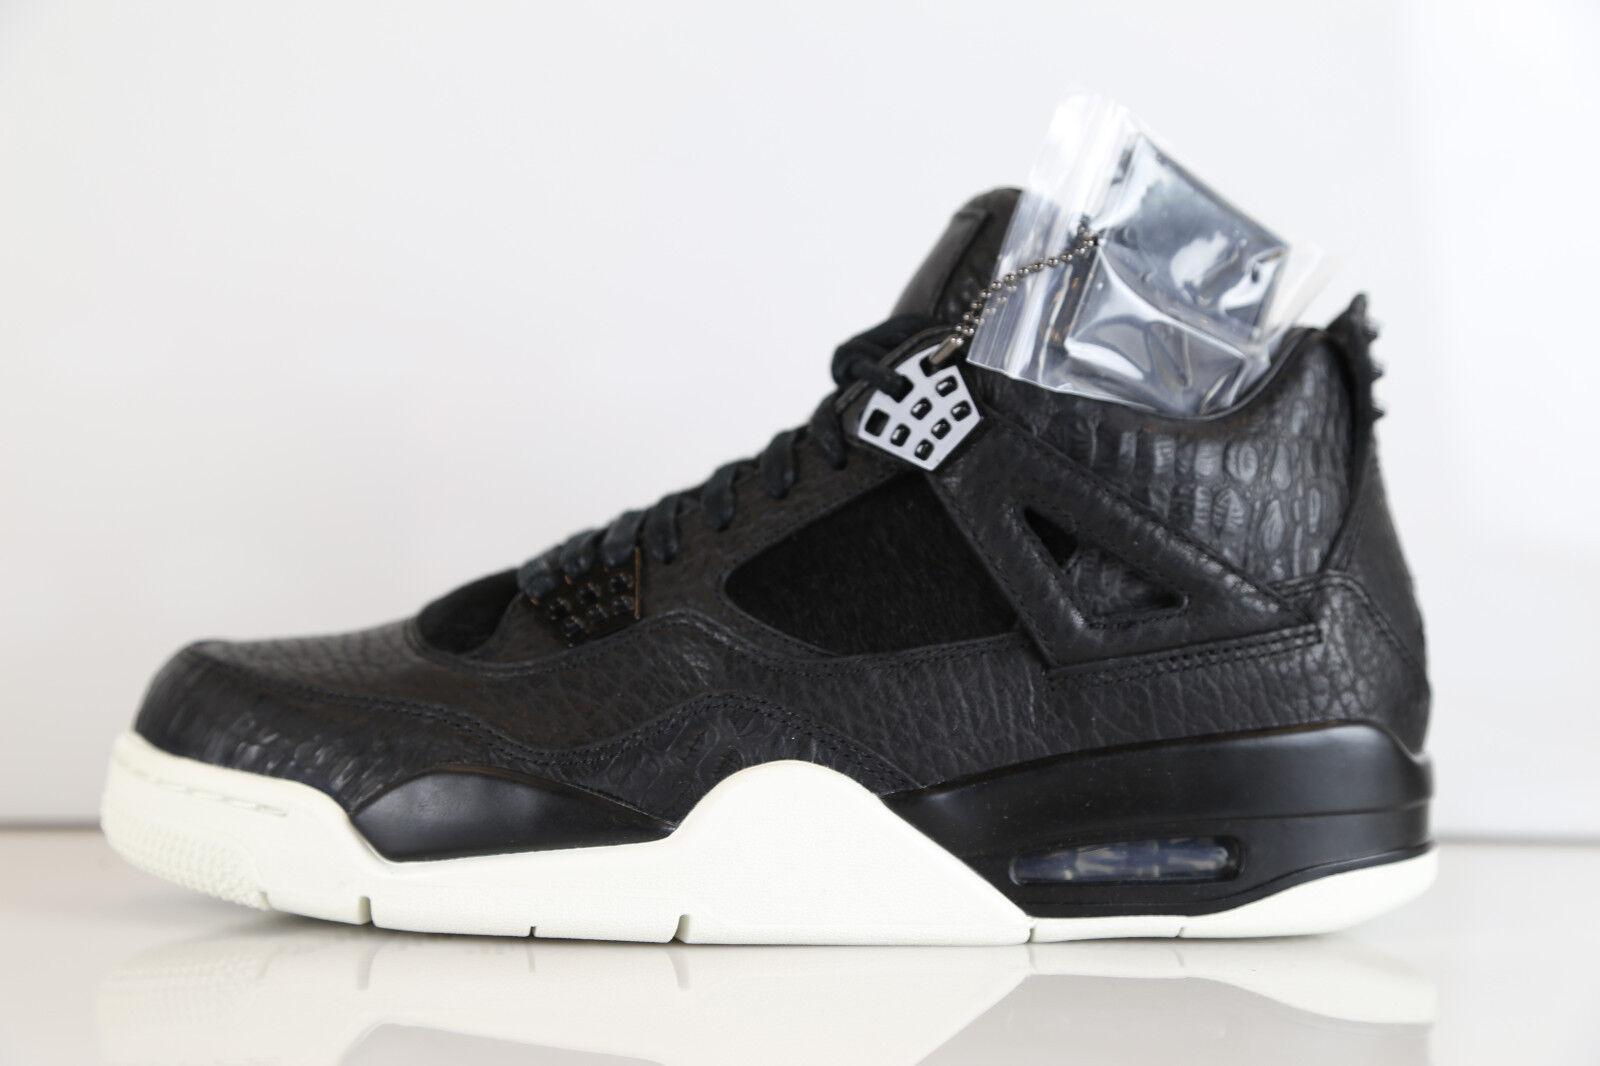 Nike Air Jordan Retro 4 Premium Pony Hair Black 819139-010 8-14 pinnacle 11 1 3